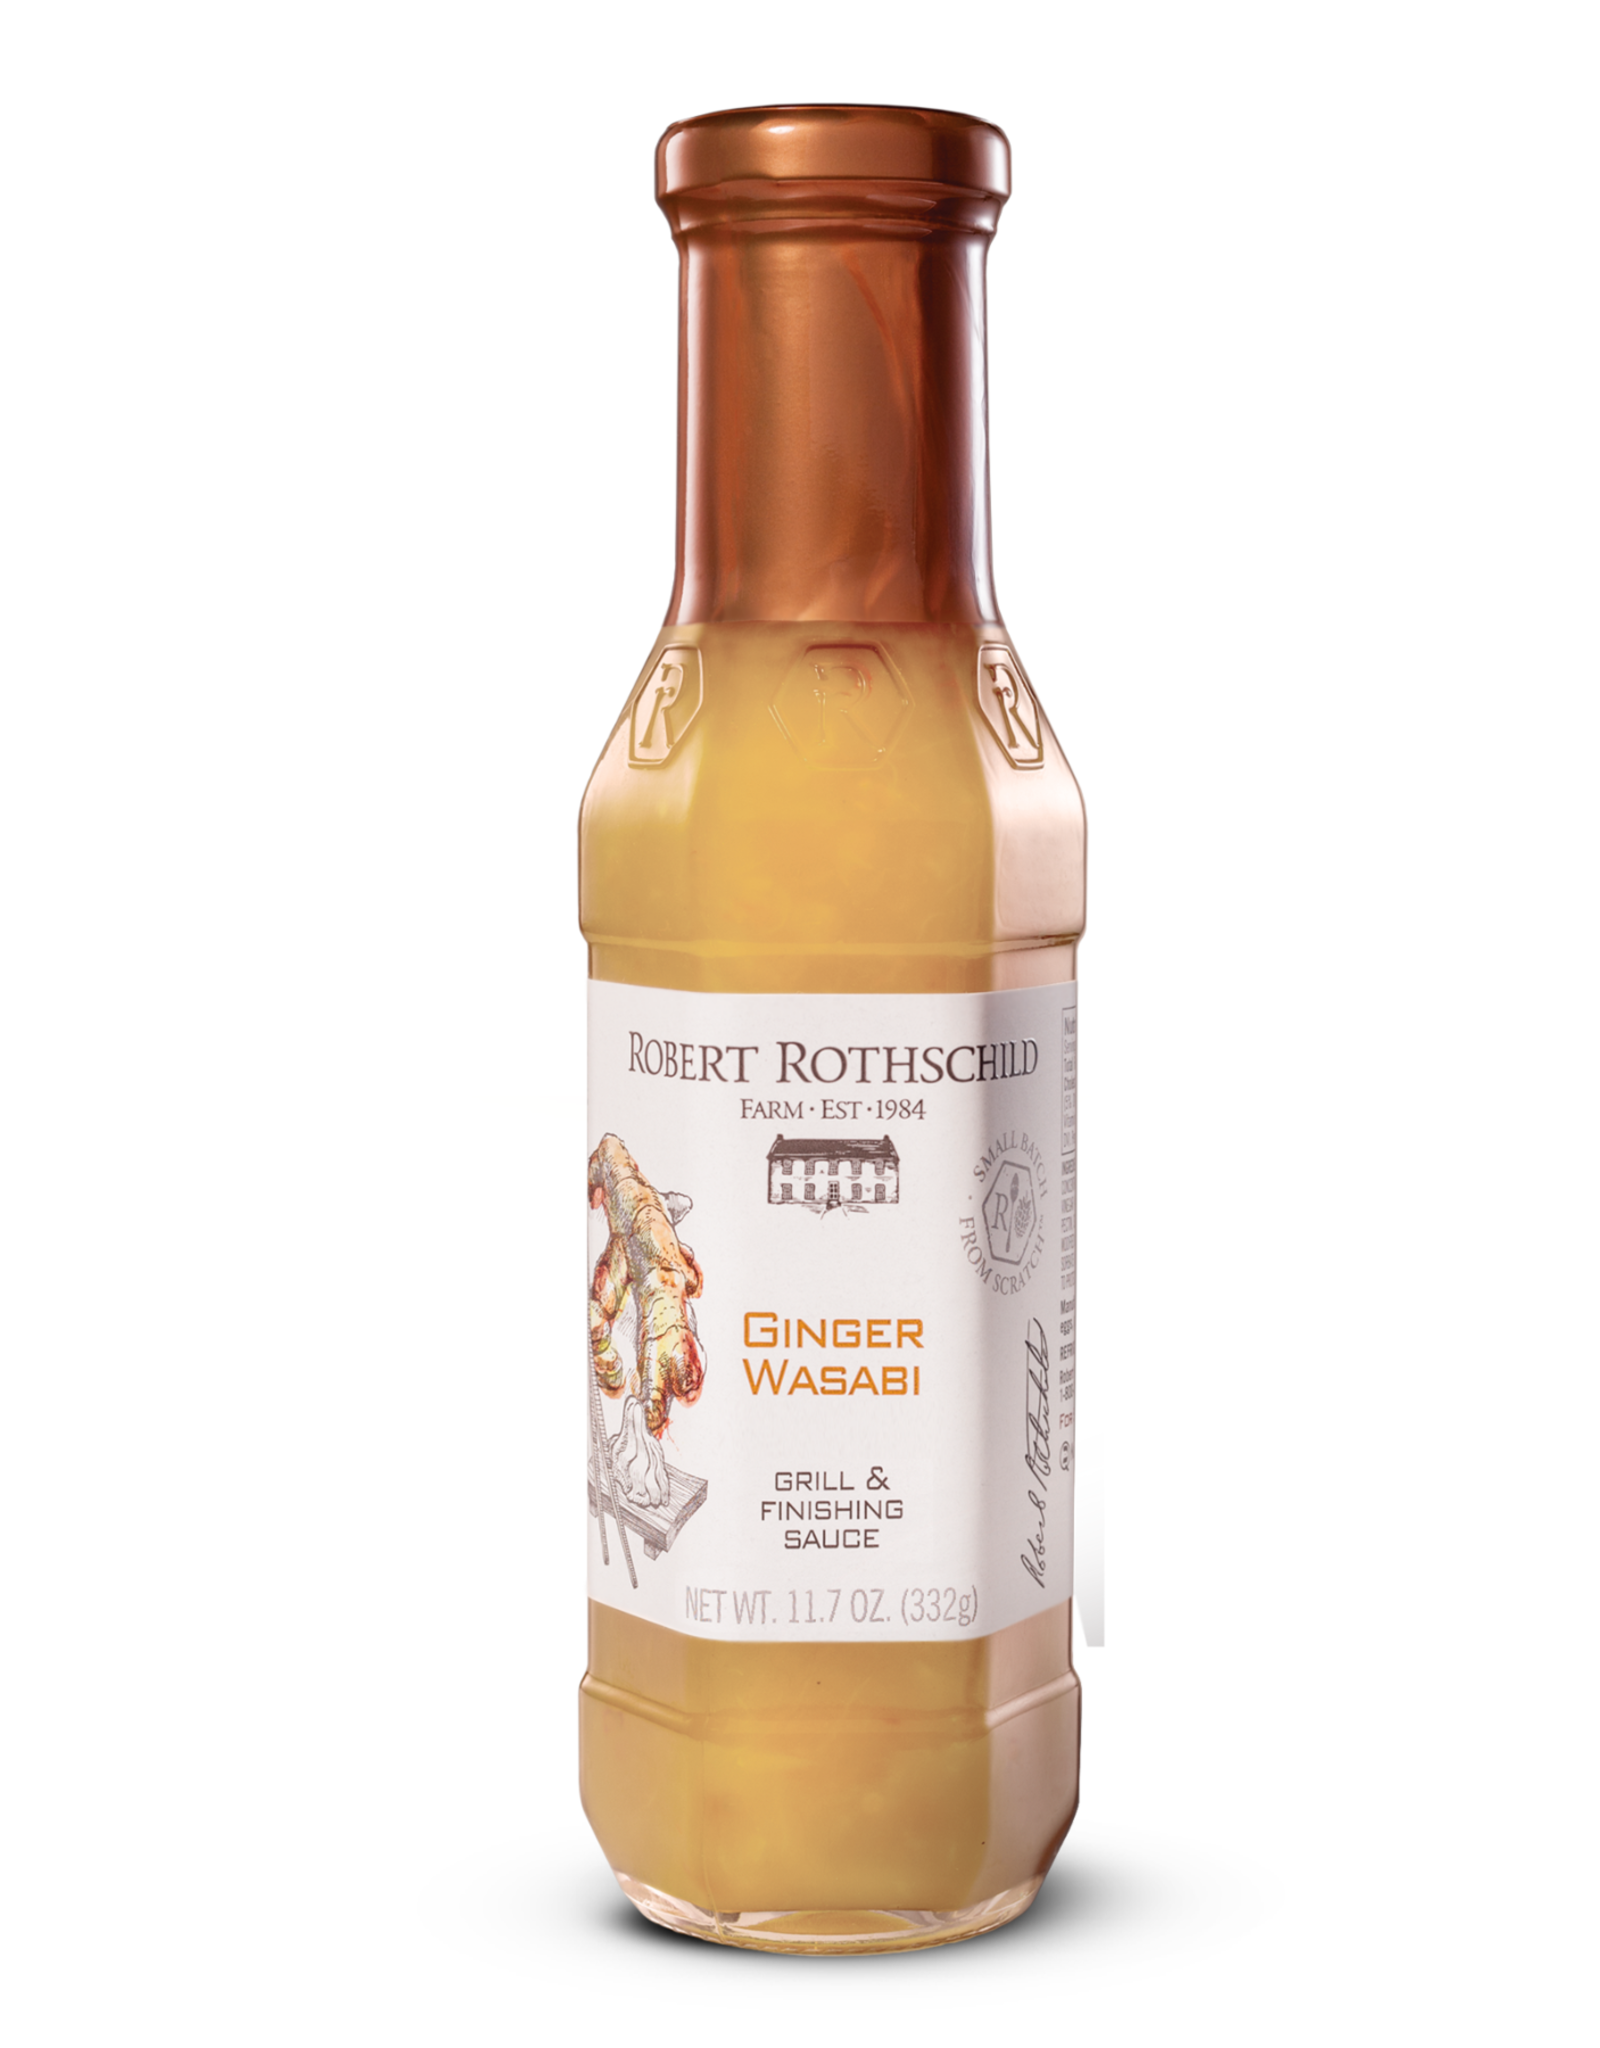 Robert Rothschild Ginger Wasabi Sauce, 11.7 oz